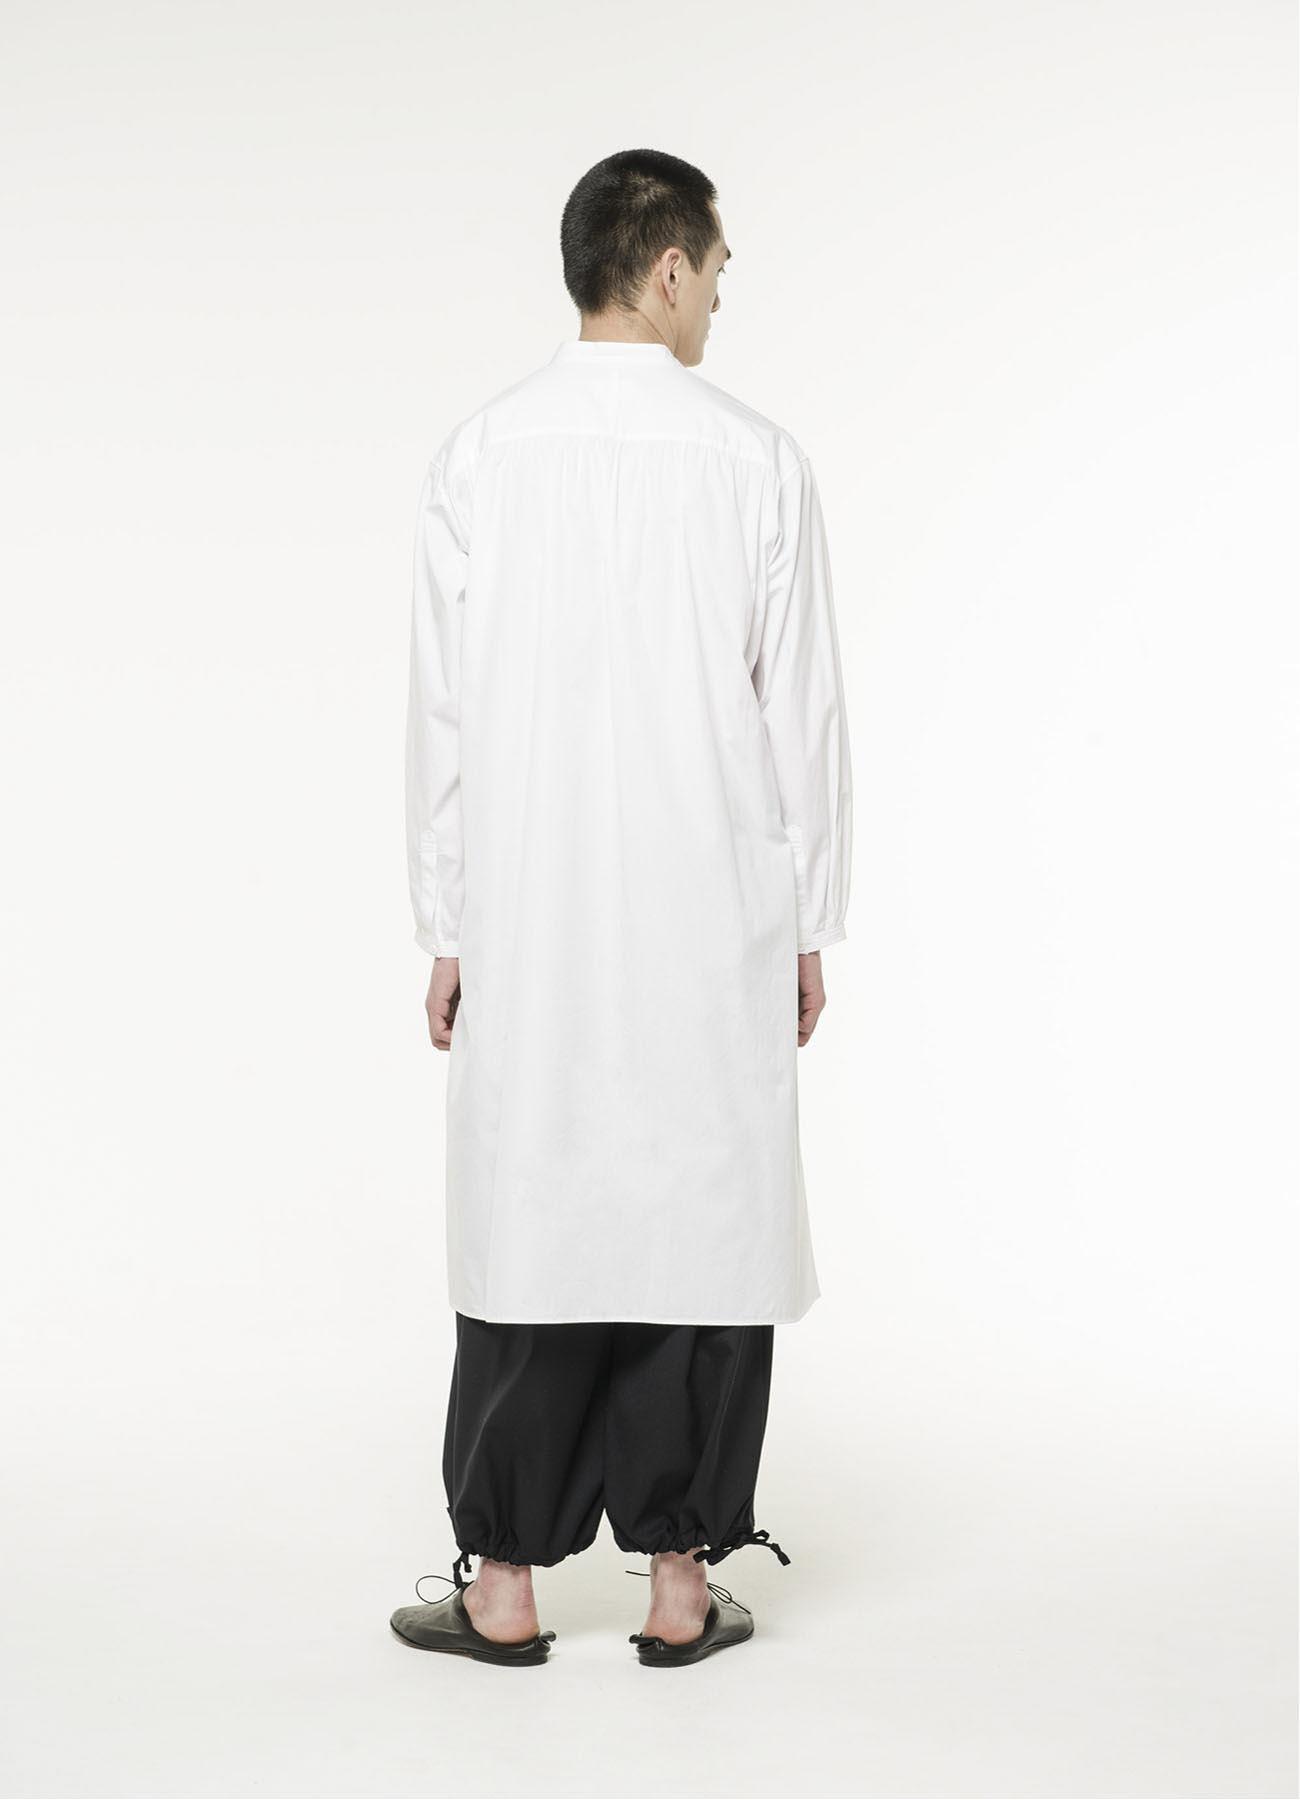 100/2 Broad Gather pullover Big long shirt